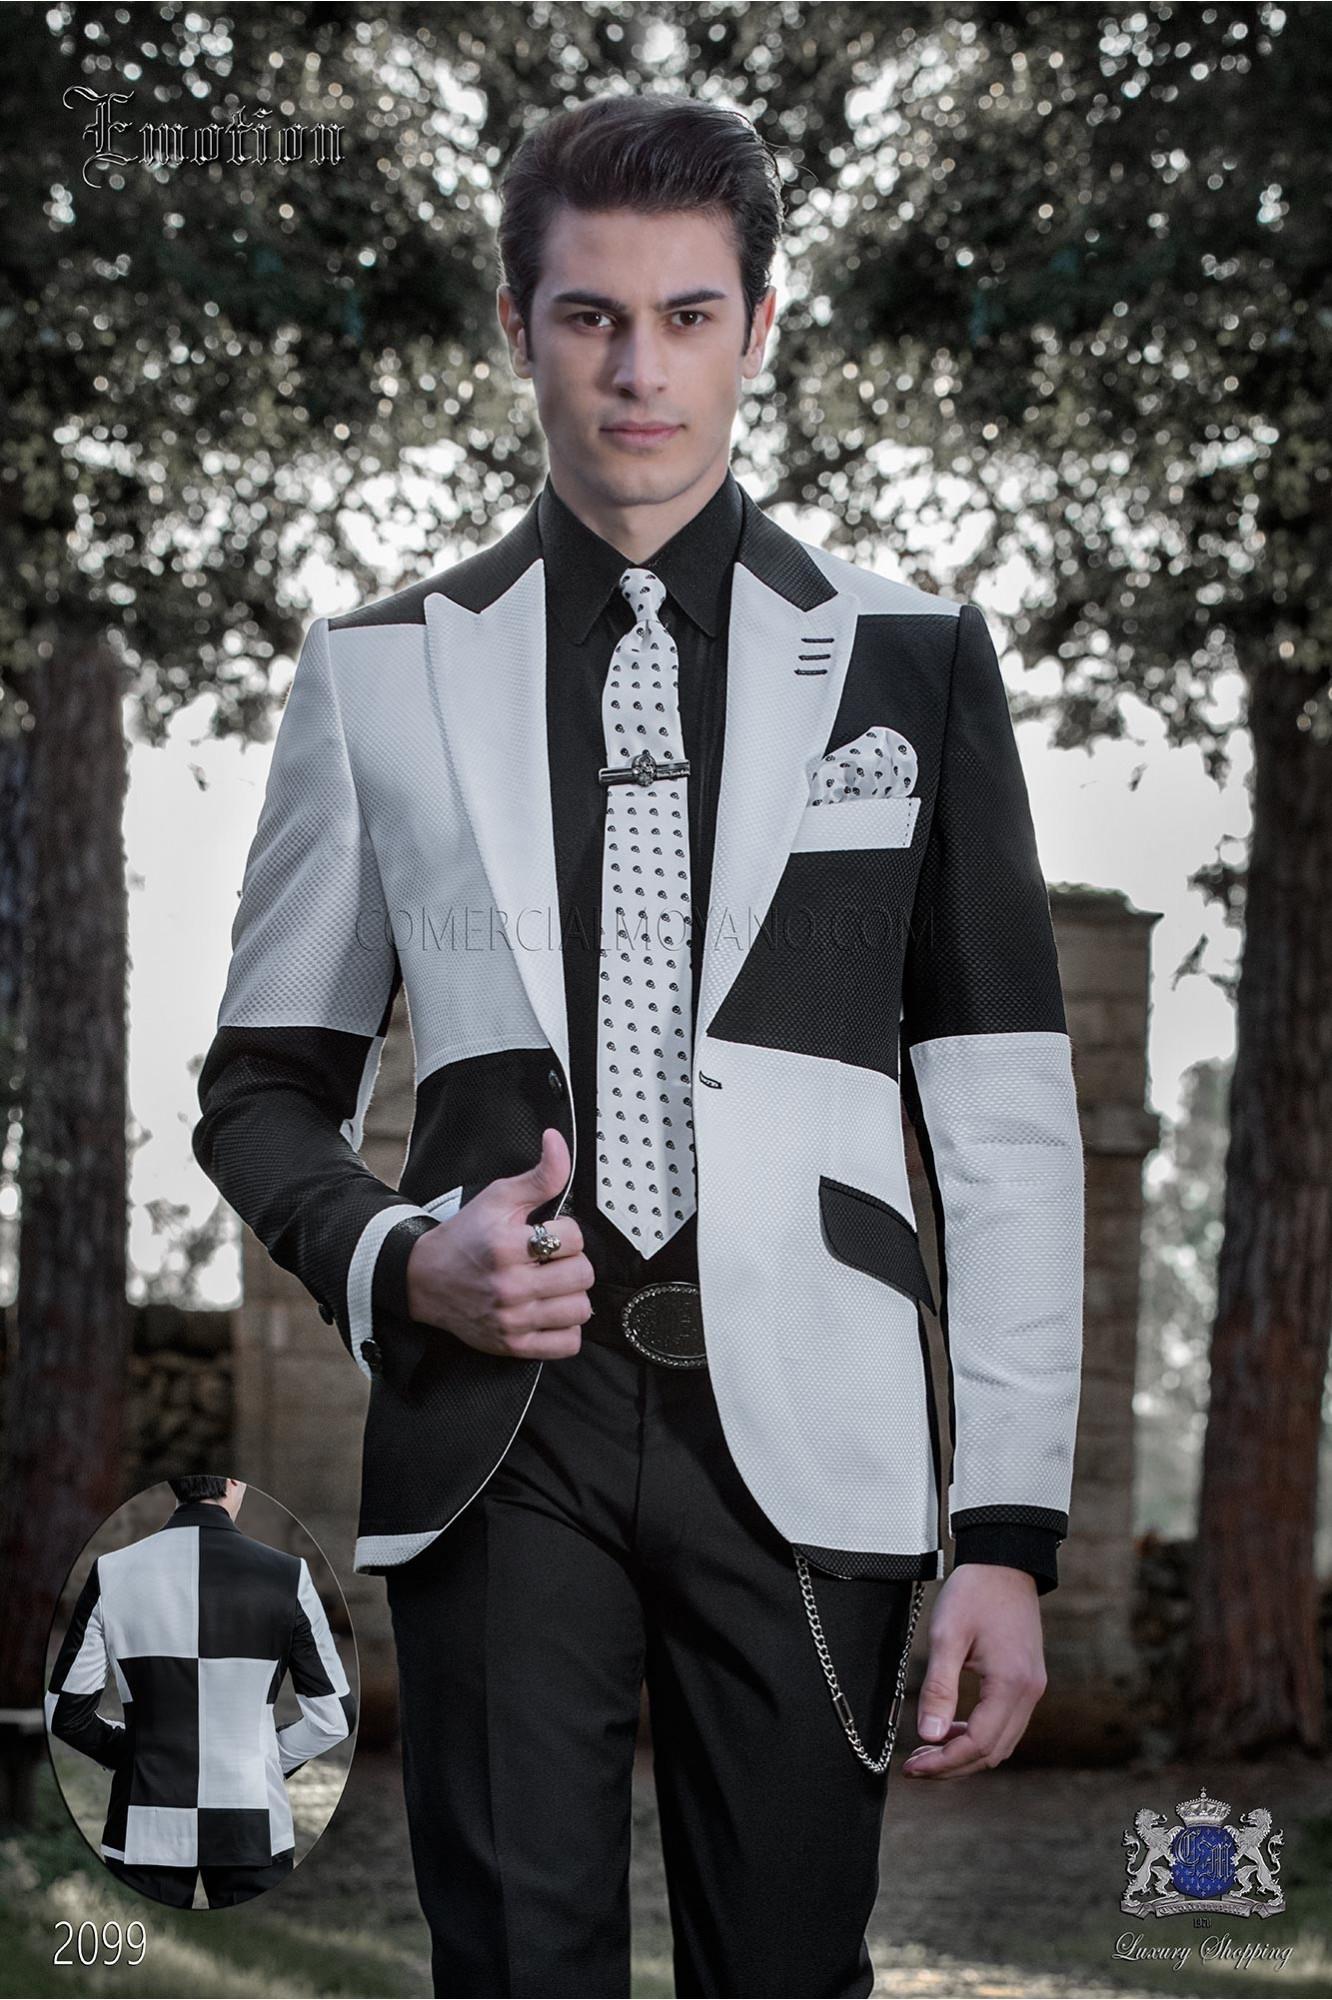 Chaqueta Patchwork blanco y negro. Tejido mixto lana